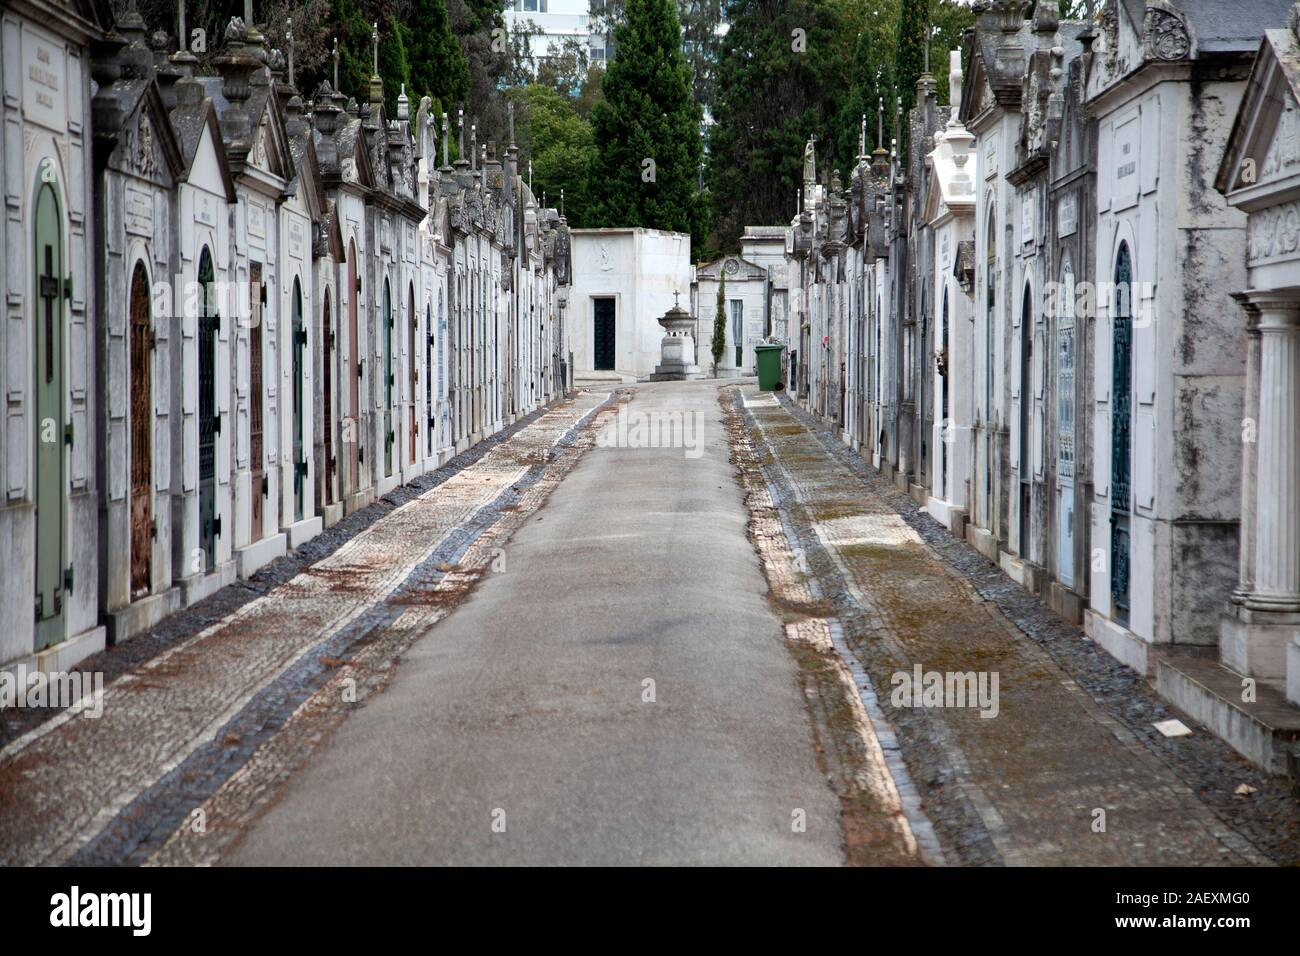 Prazeres Cementerio de Lisboa, Portugal. Foto de stock